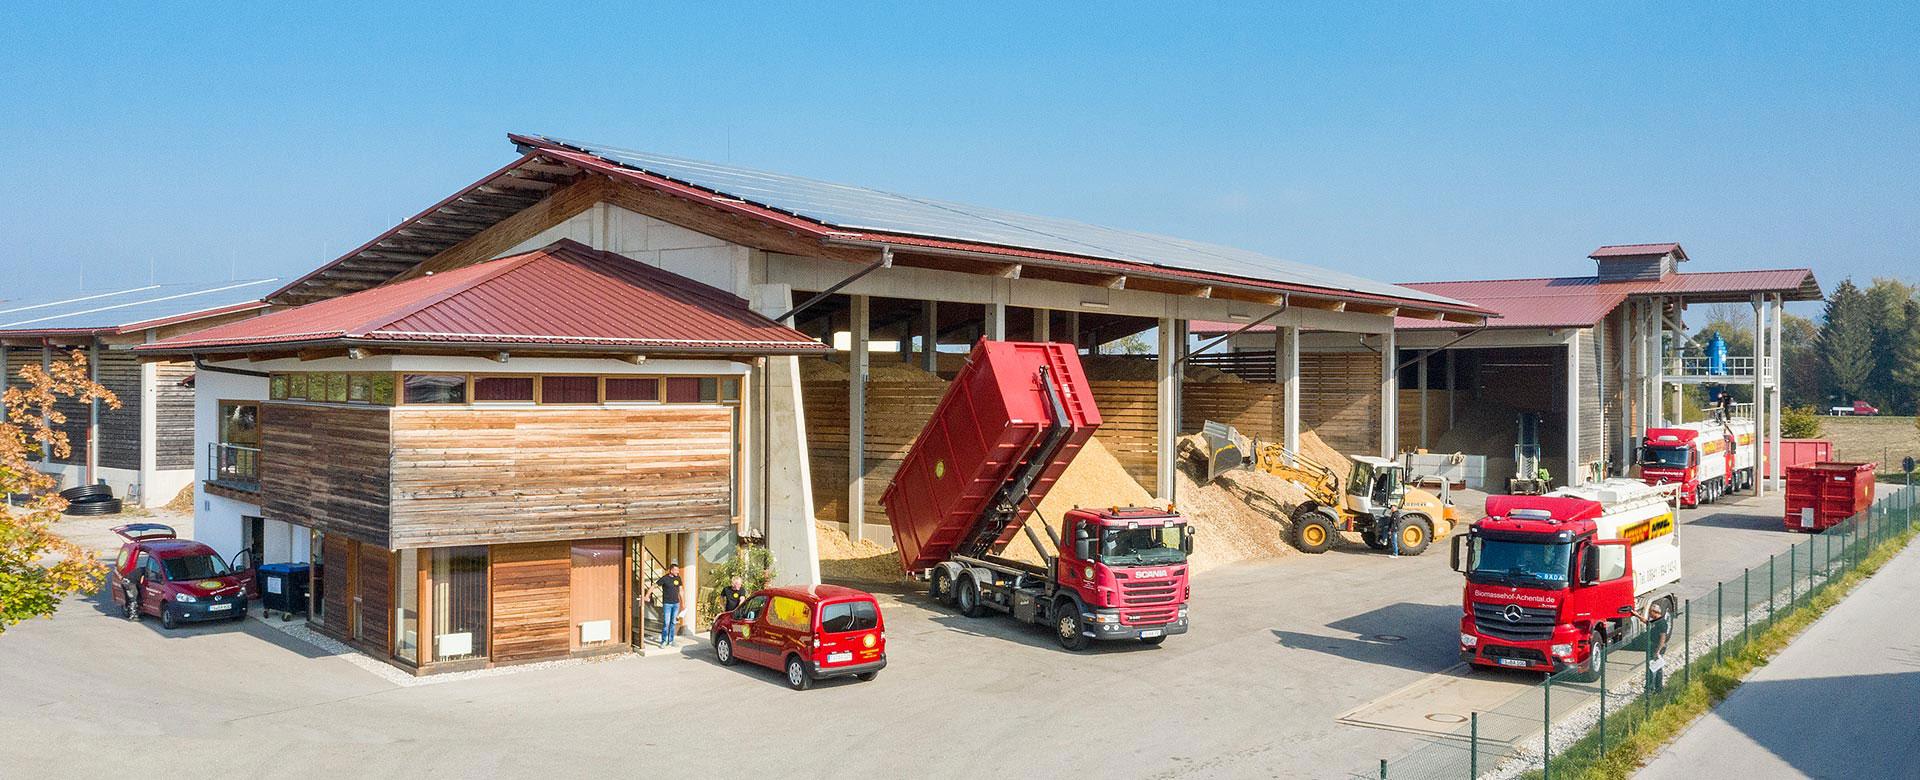 The Biomass Trade Center in Achental (Source: https://www.biomassehof-achental.de)